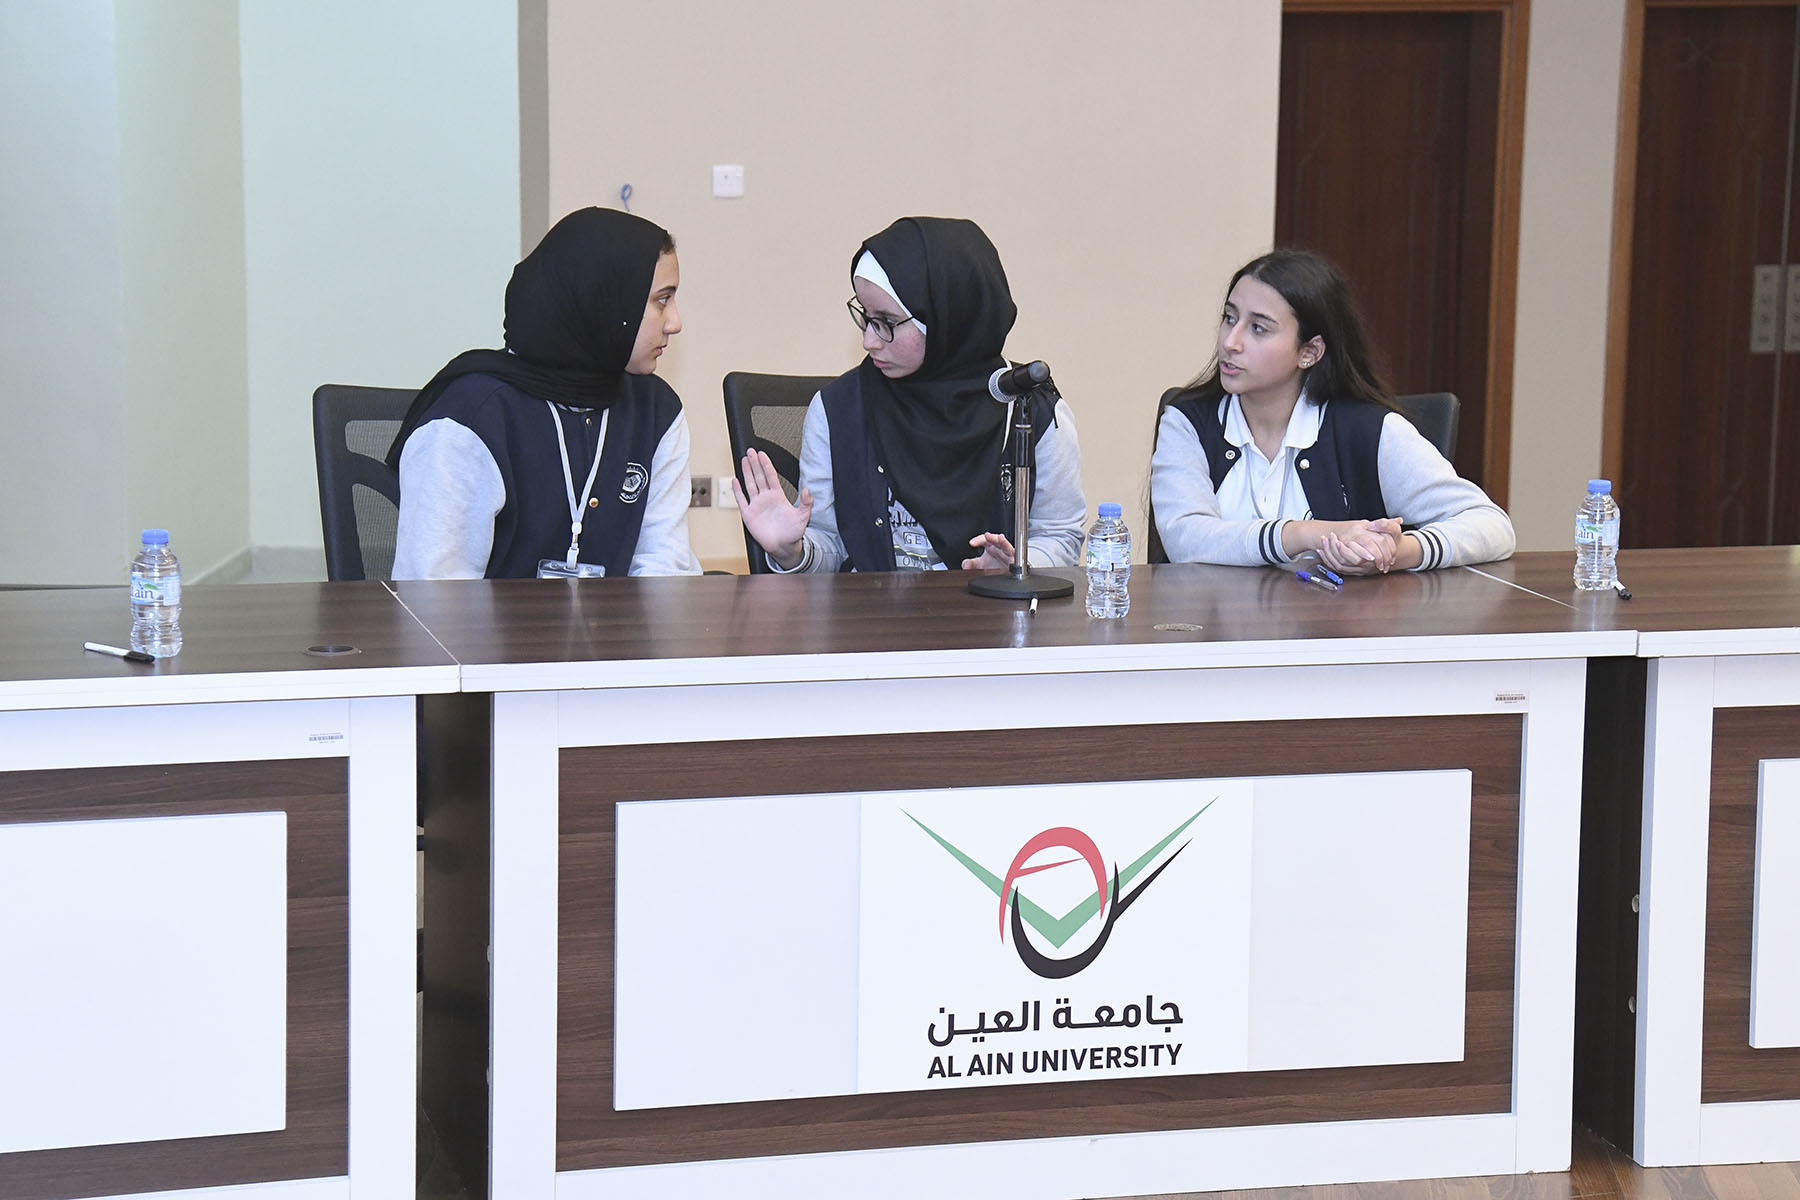 Sixth Day (Emirates Private School - Abu Dhabi VS Baraem Al Ain Private School Bani Yas)